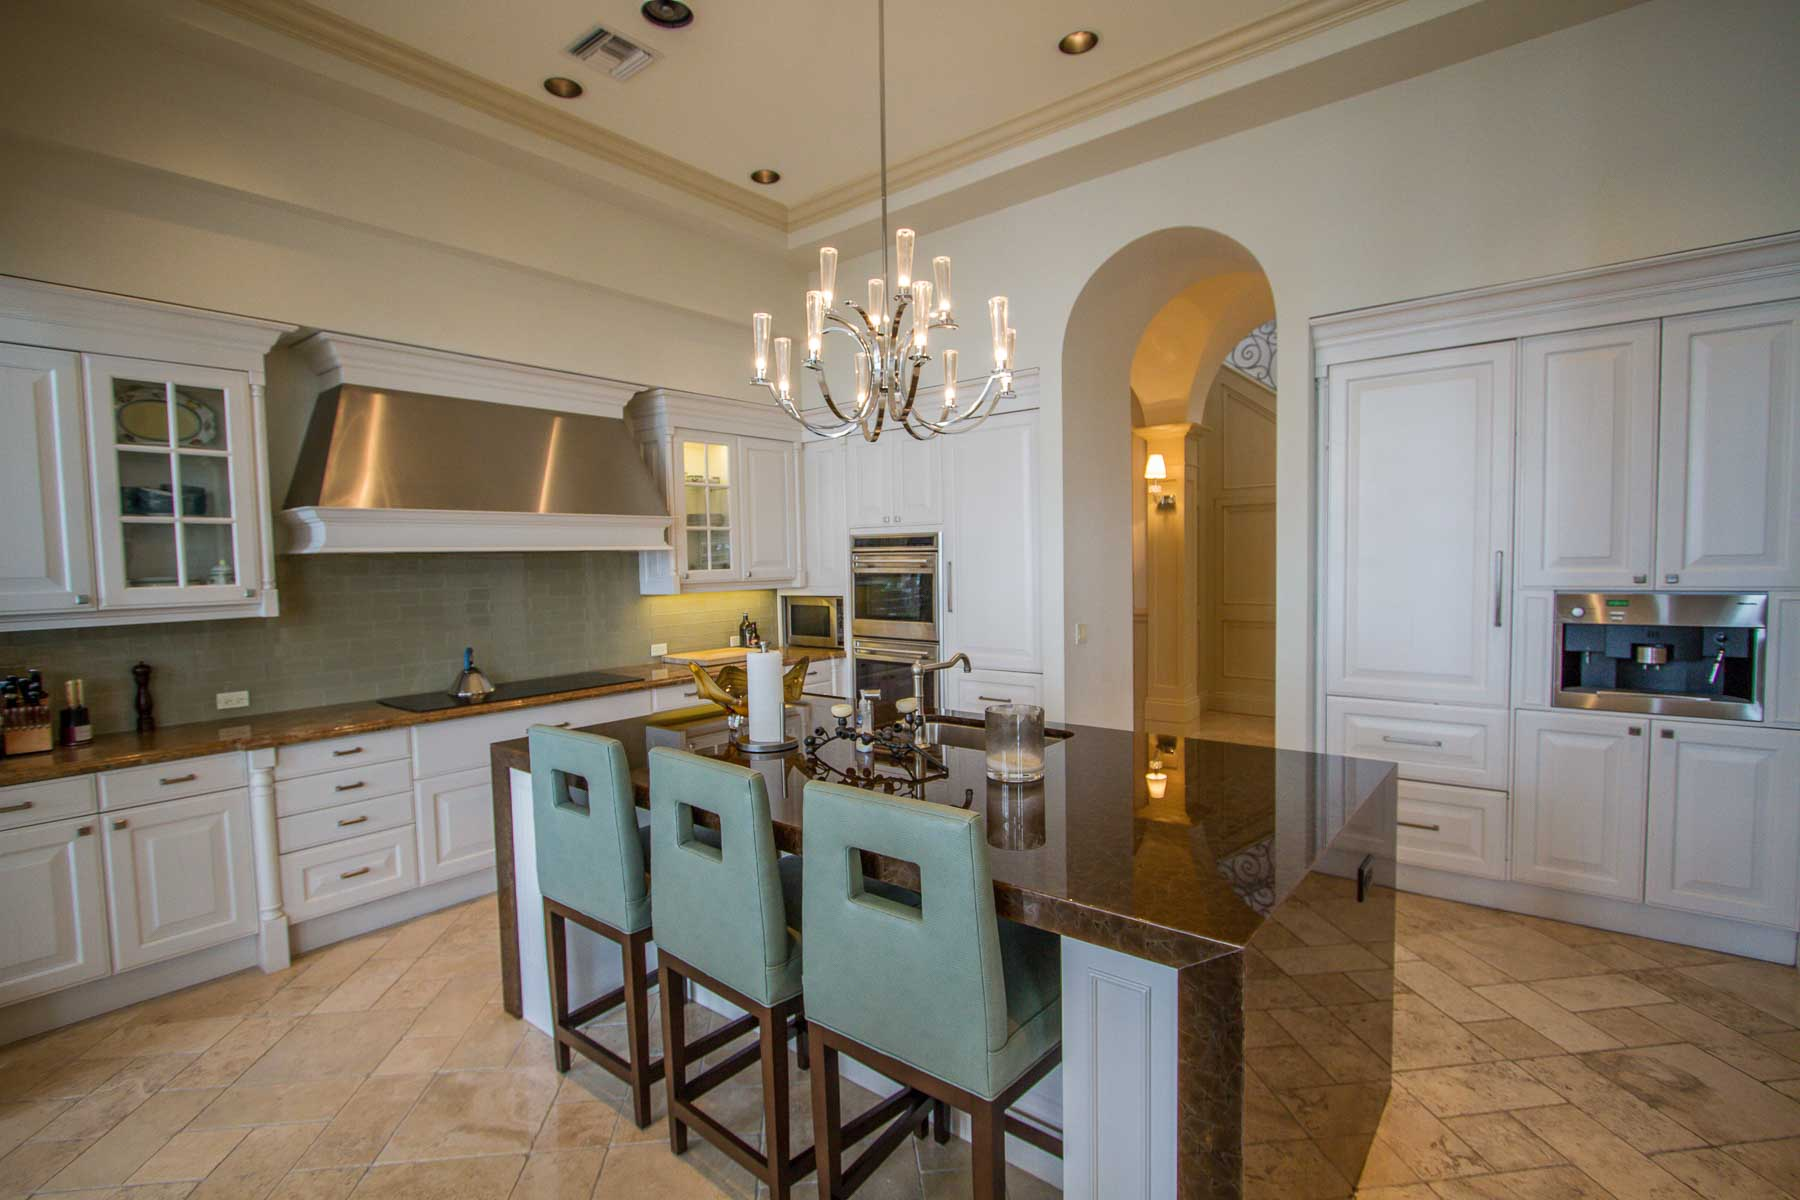 Additional photo for property listing at 113 Ocean Club Estates, Paradise Island - MLS 32441 Ocean Club Estates, Paradise Island, Nassau And Paradise Island Bahamas